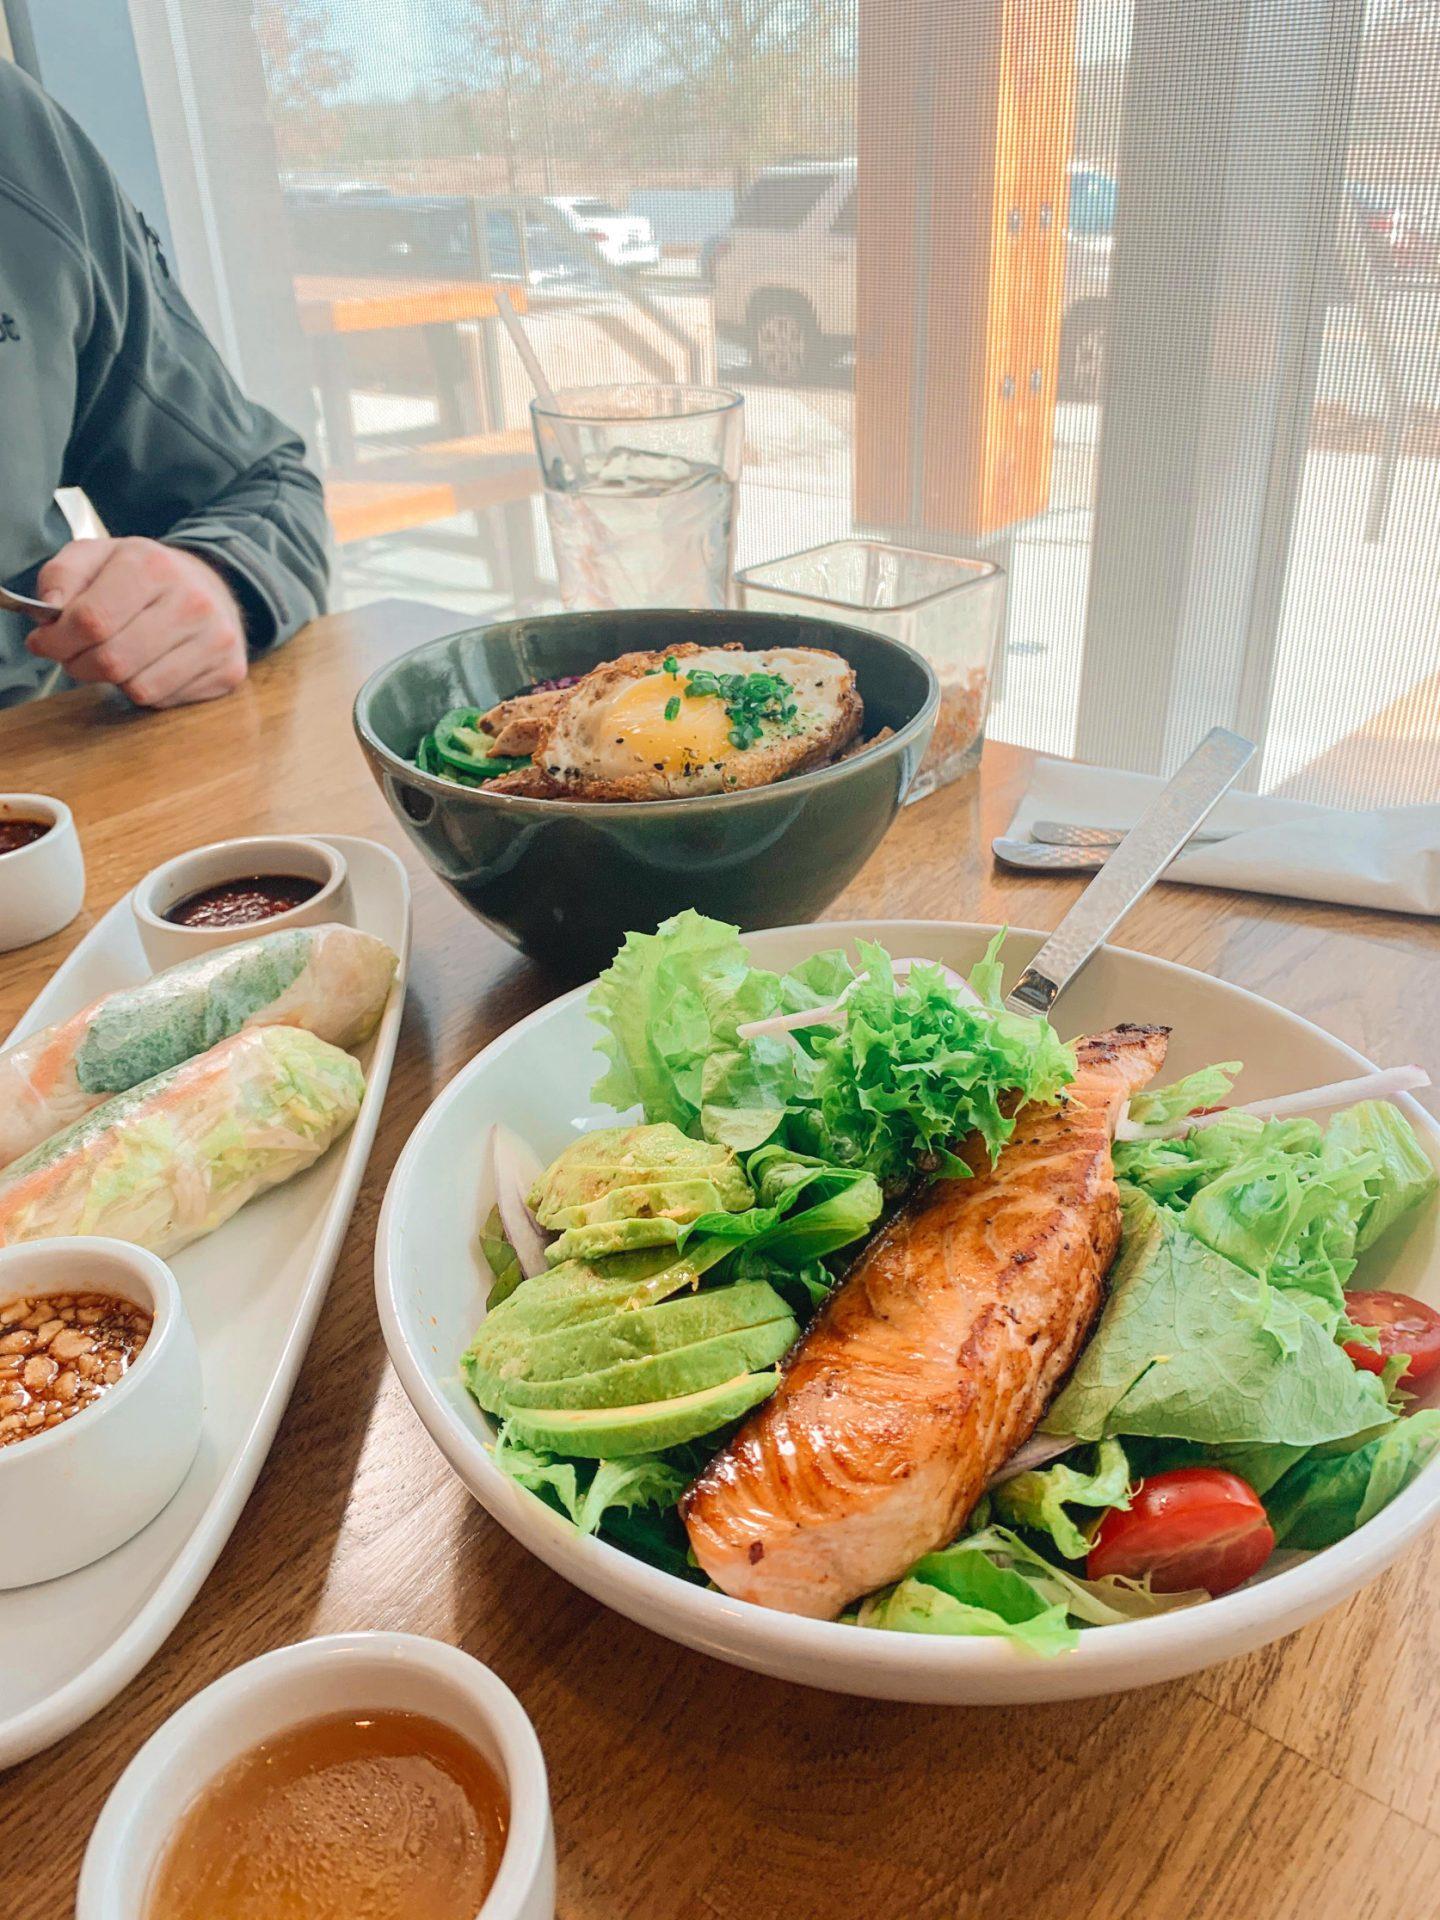 Kingsley, spice, fort mill, South Carolina, restaurant, salmon salad, healthy eating